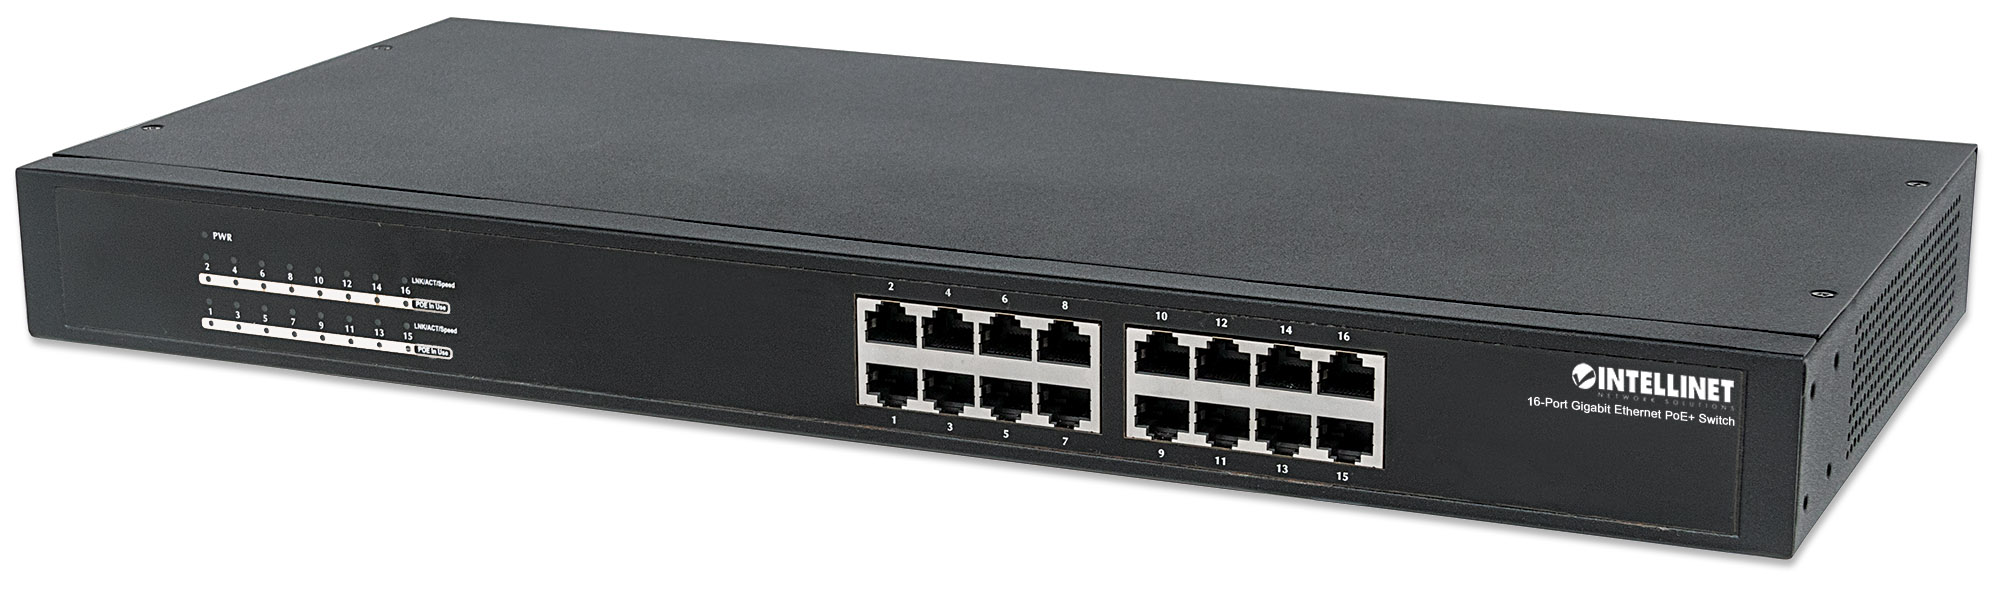 16-Port Gigabit Ethernet PoE+ Switch